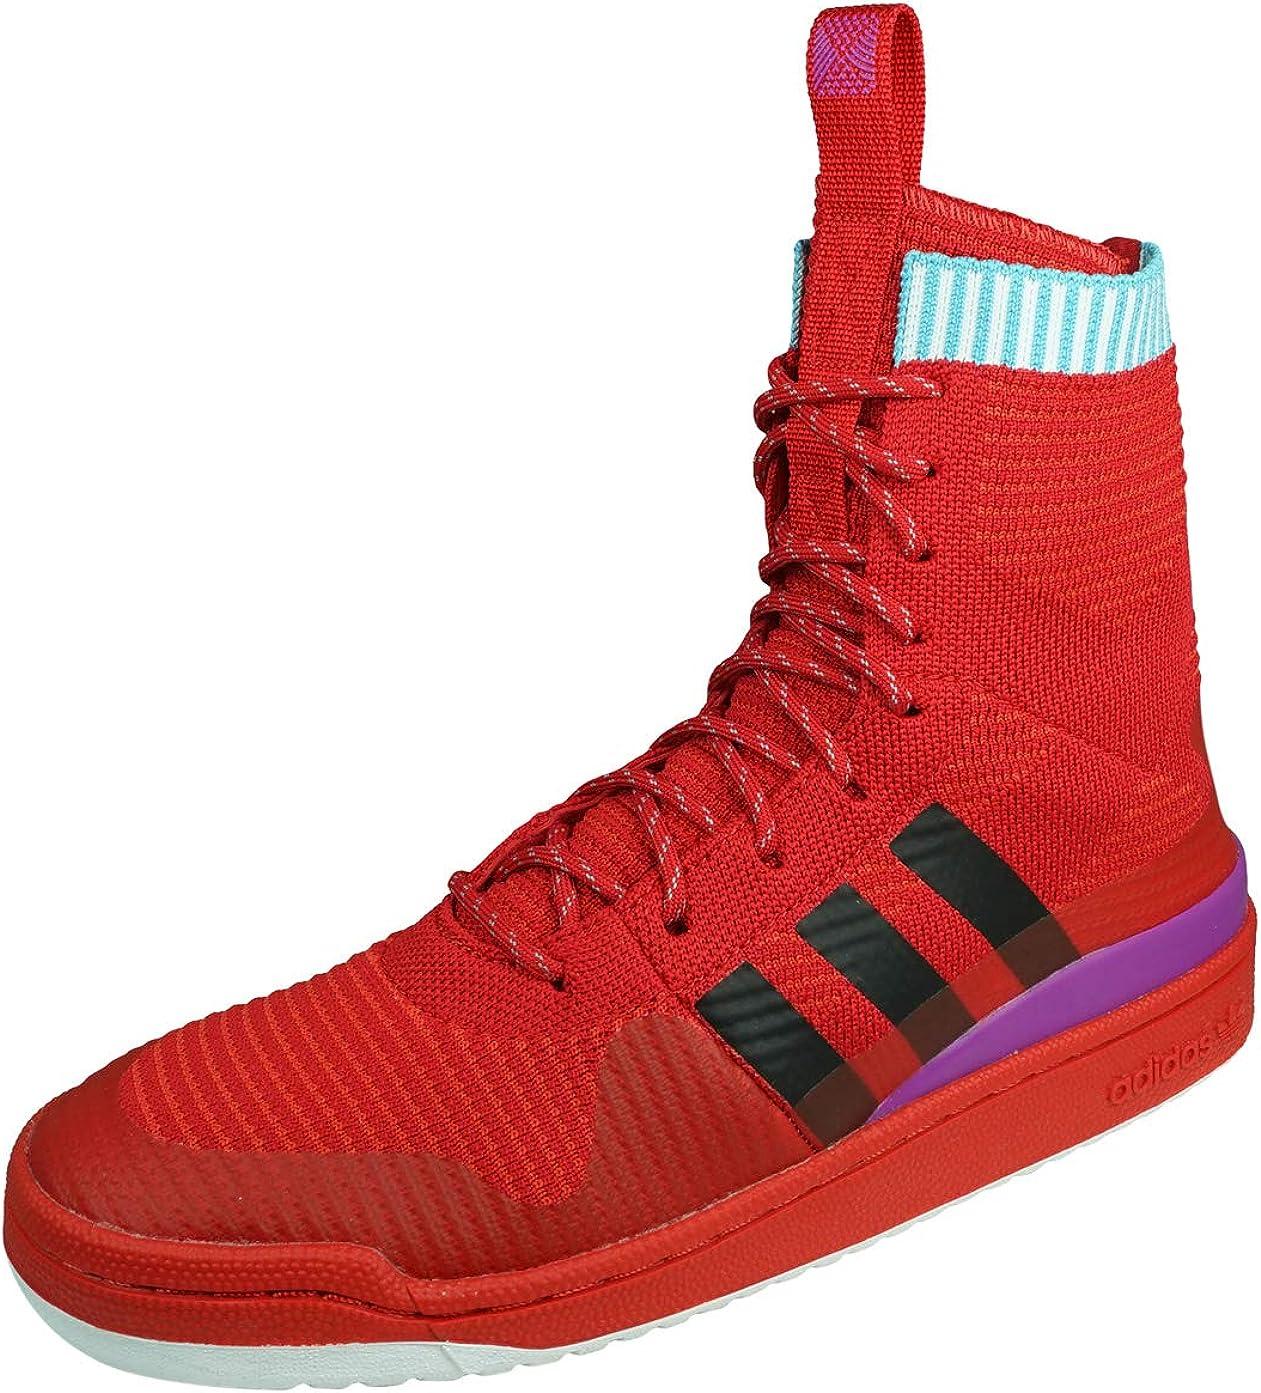 Forum Winter Pk Fitness Shoes